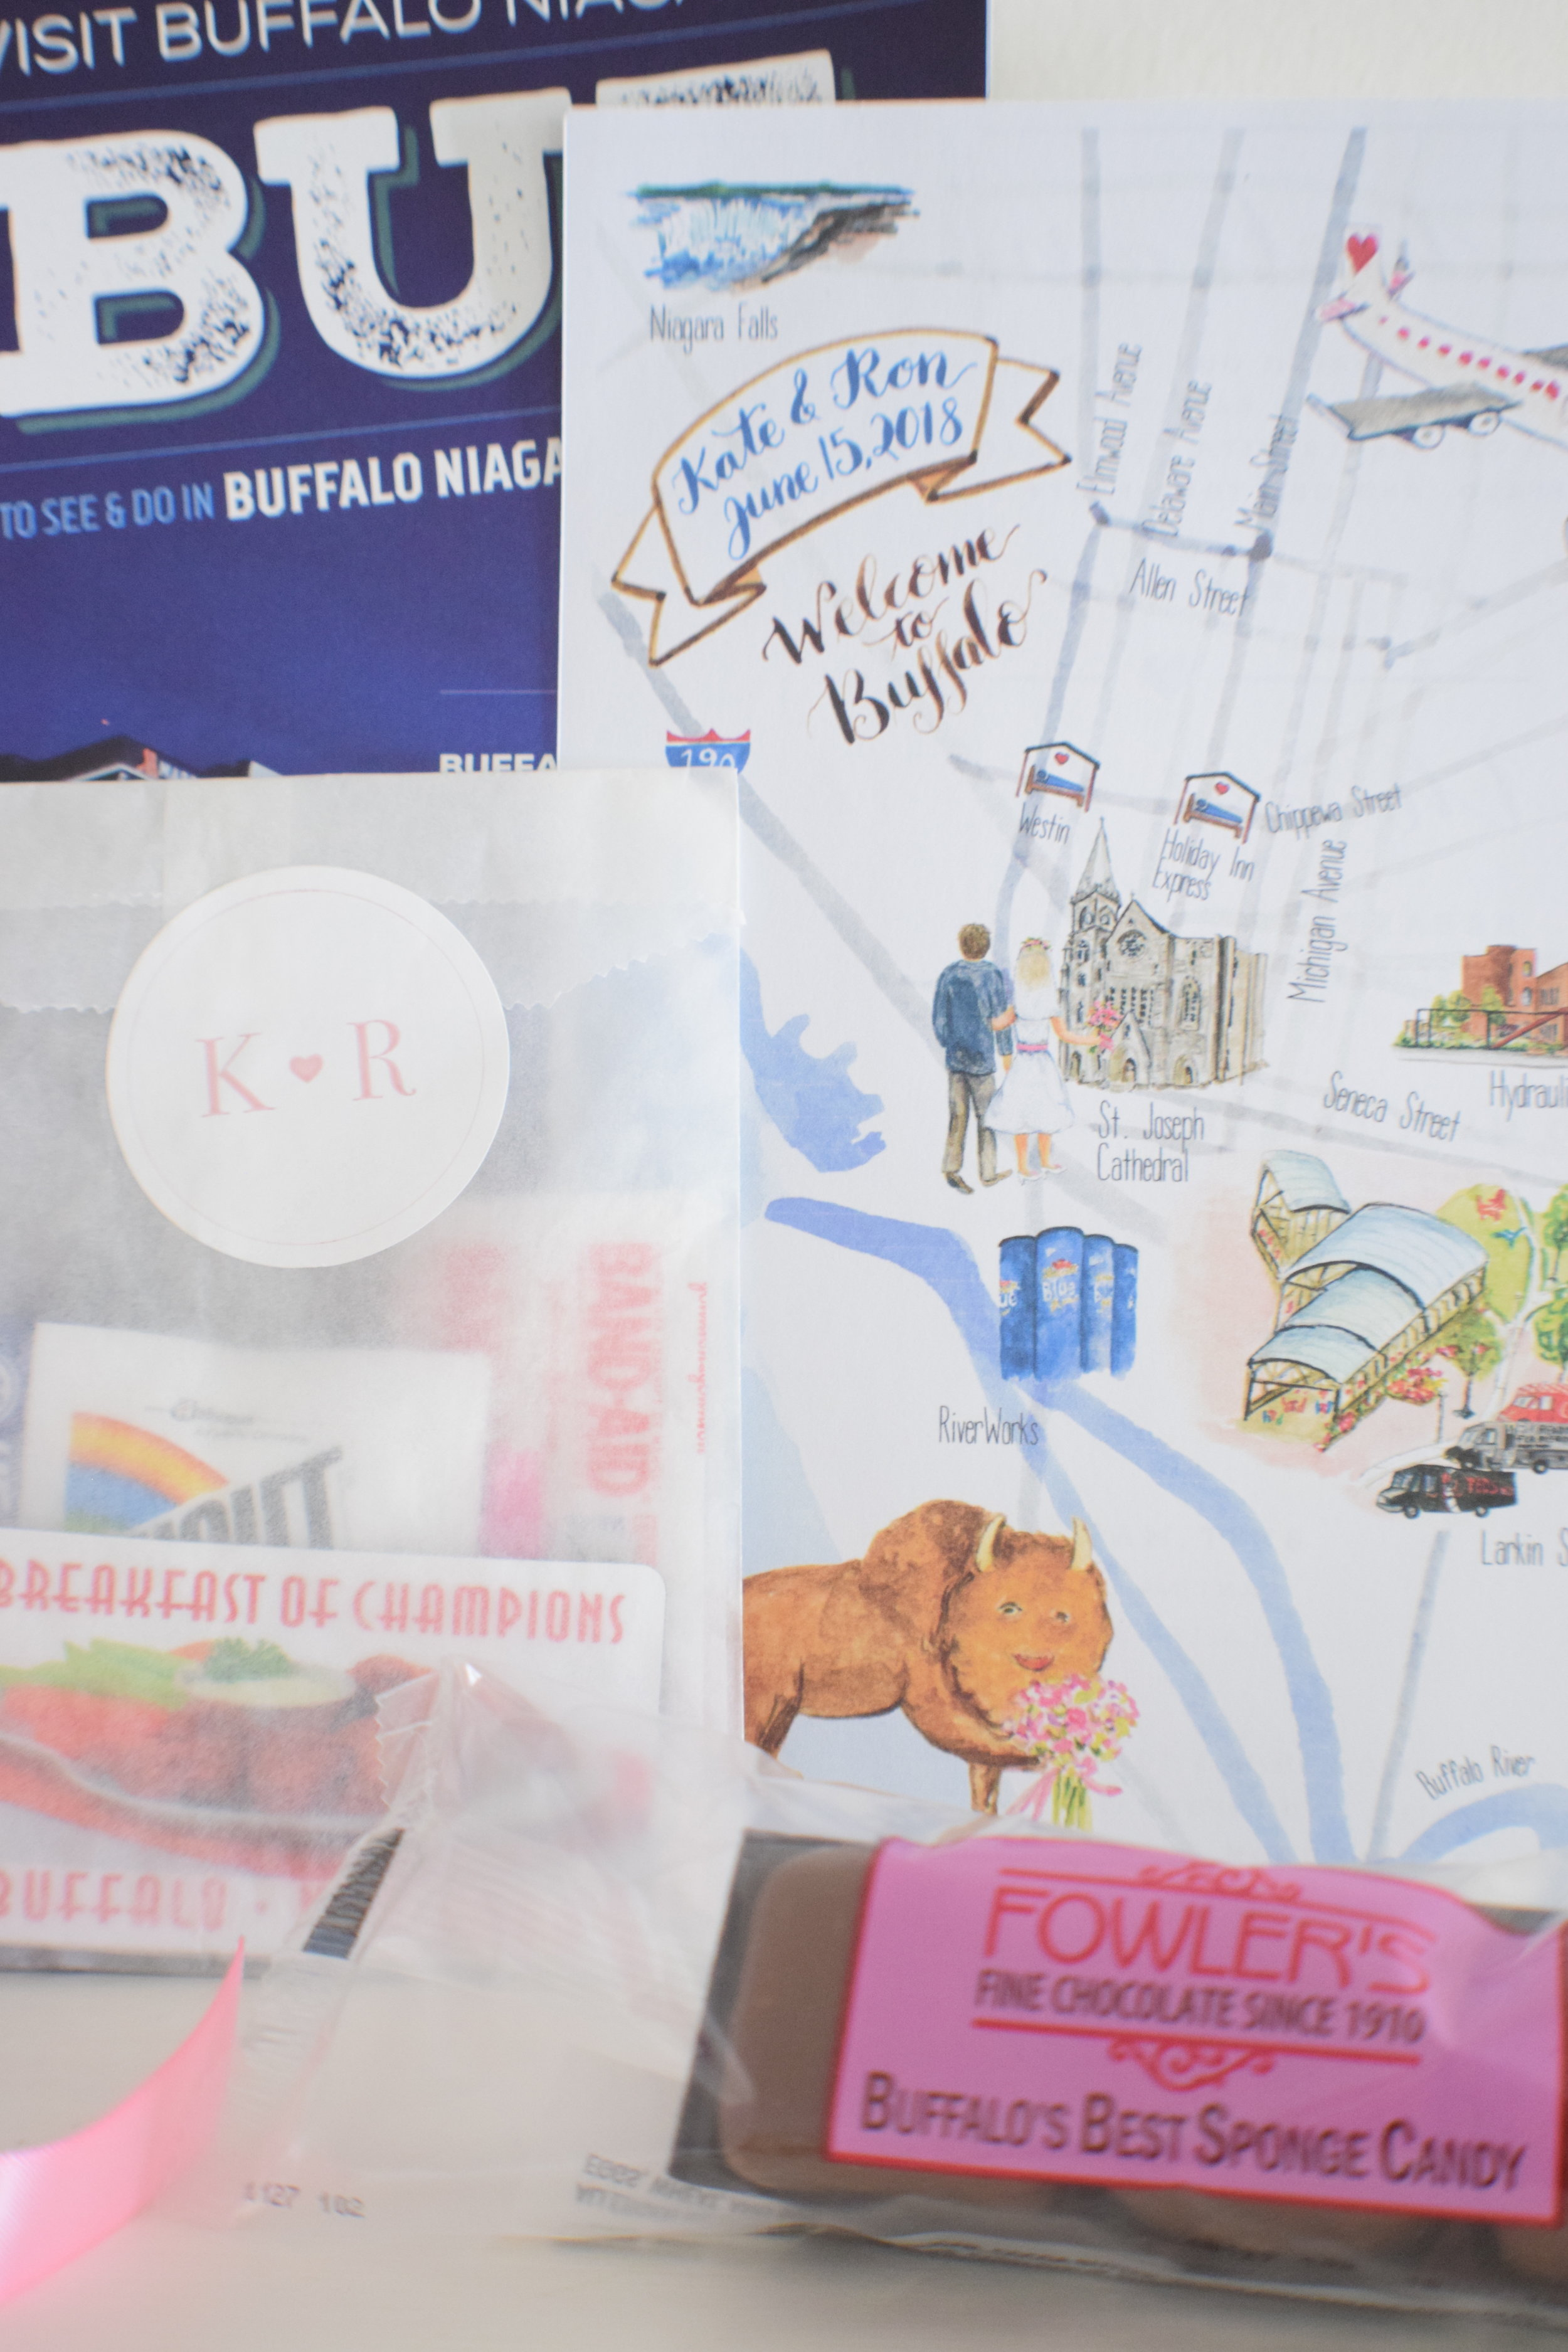 Idea for a room drop - something local. Example of Buffalo wedding hotel room drop | Social Maven Wedding Planners